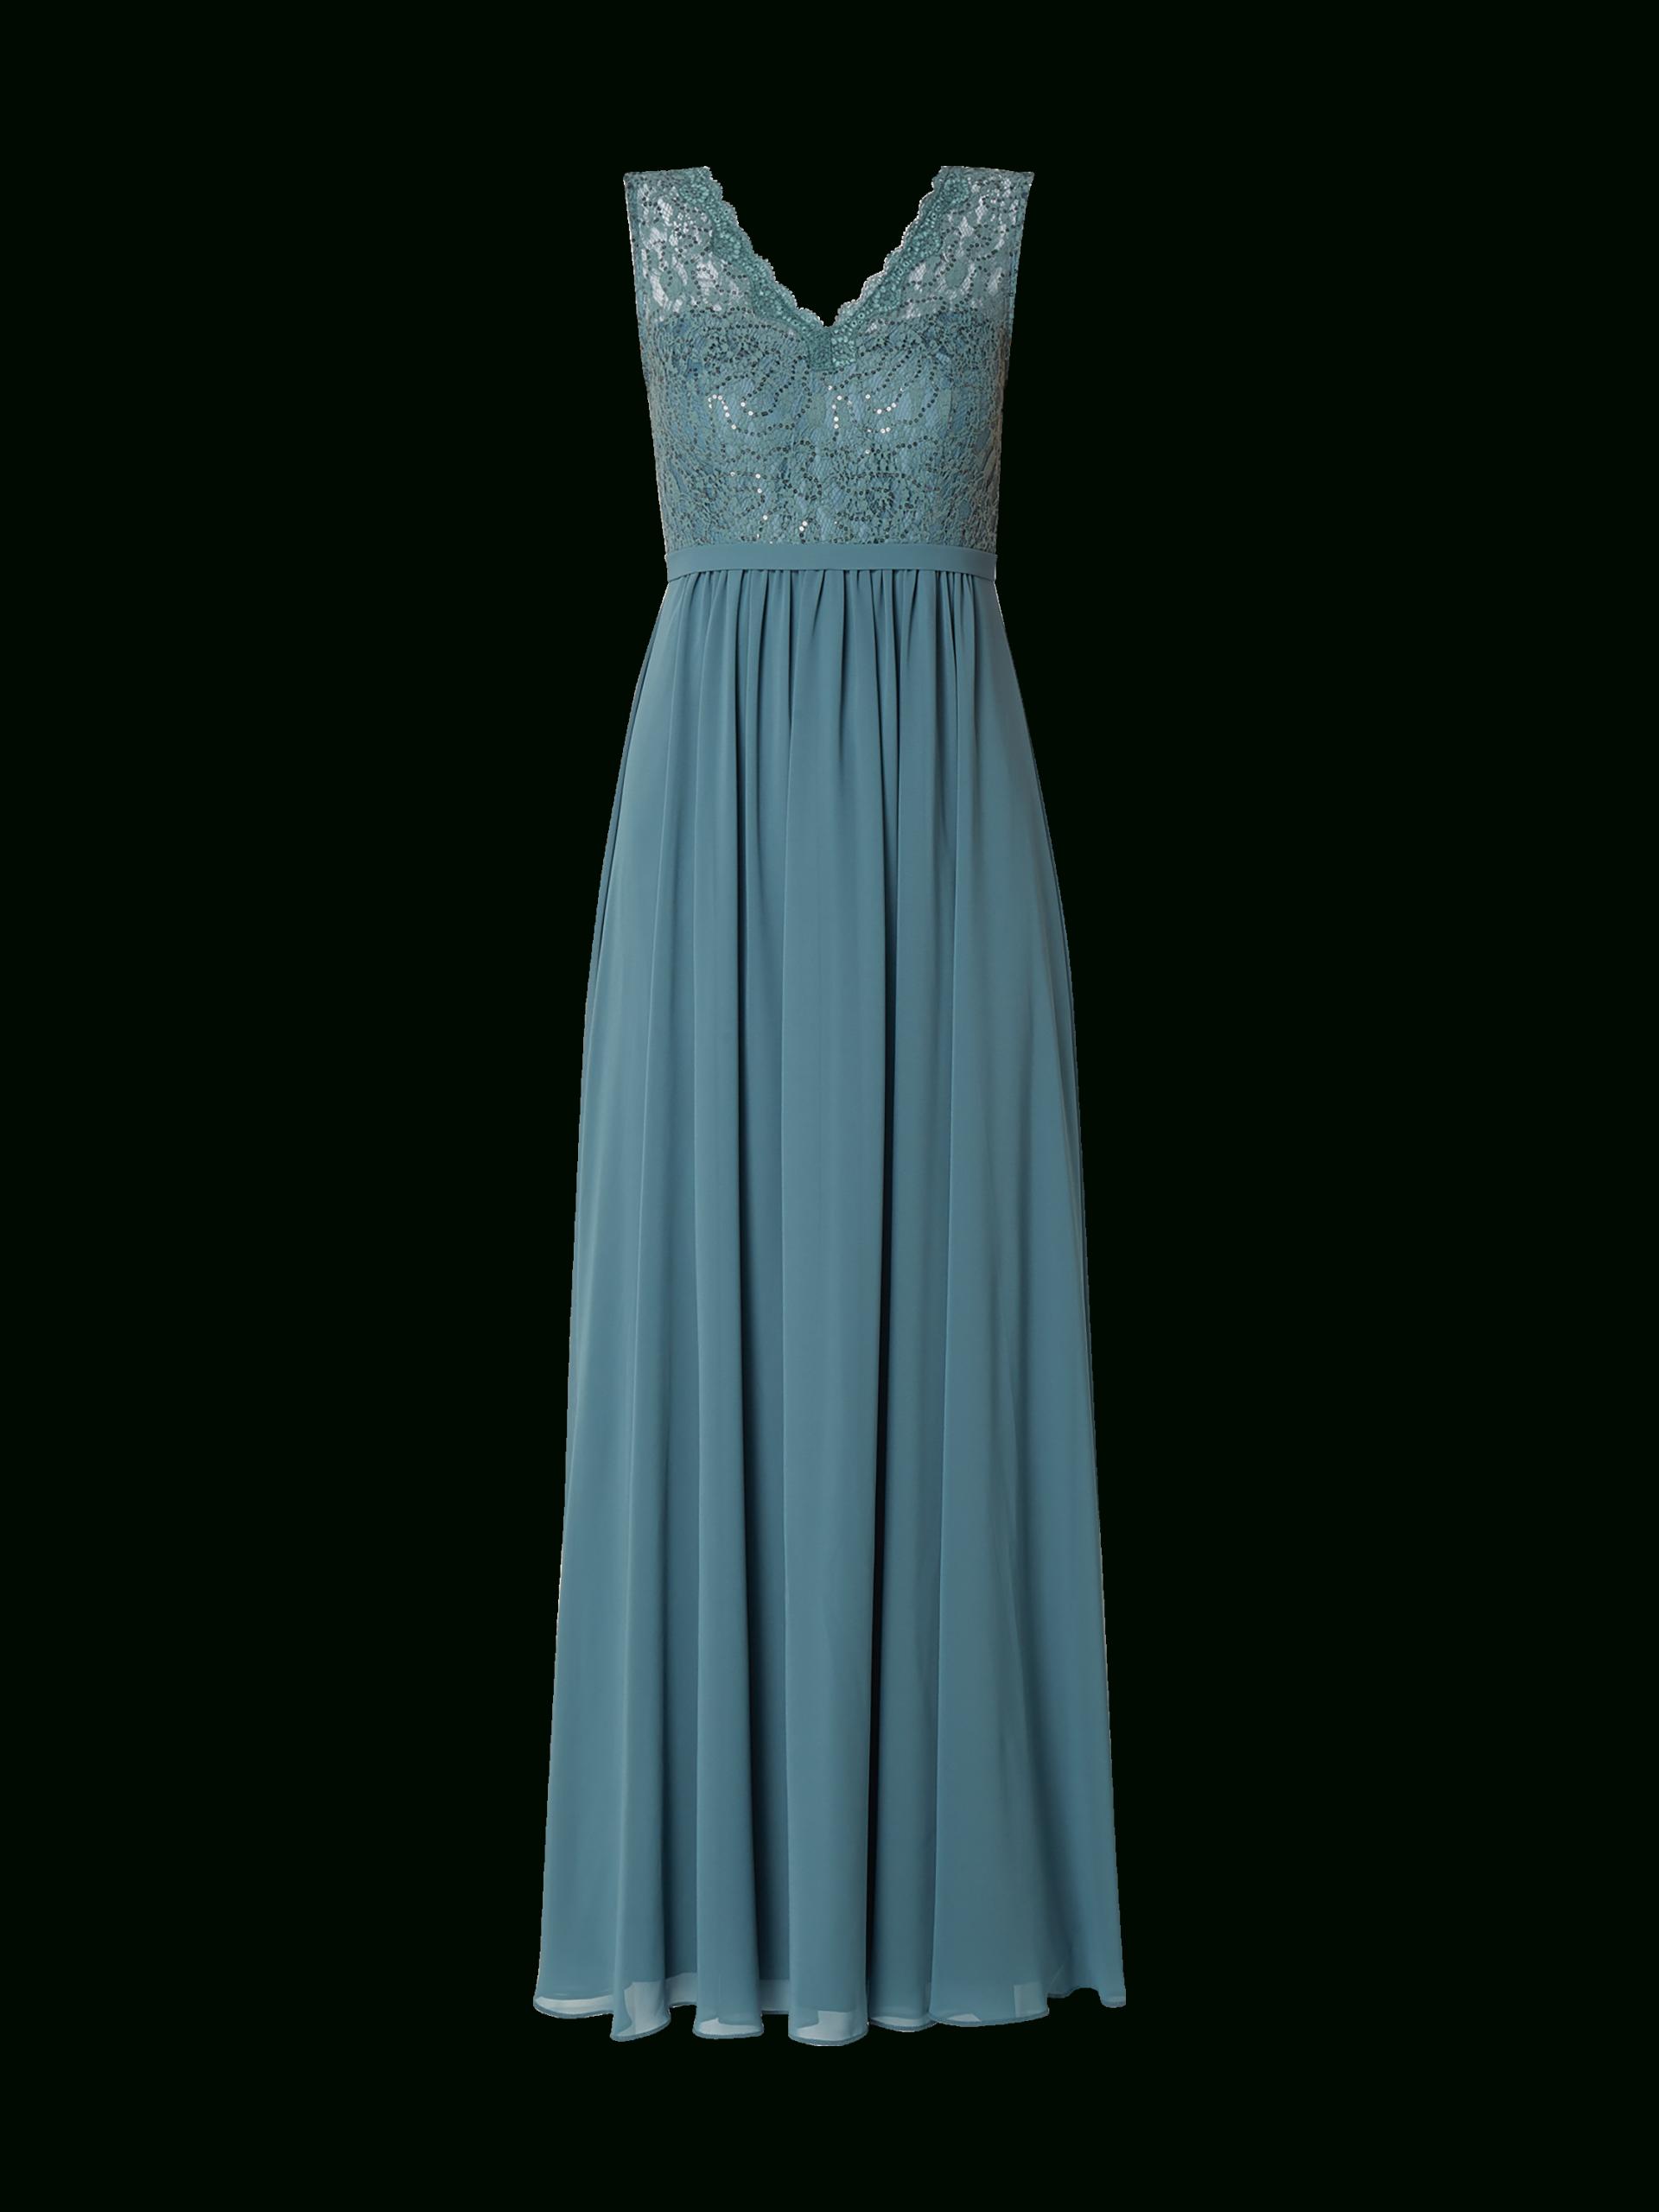 Abend Spektakulär Abendkleid Olivgrün Vertrieb20 Genial Abendkleid Olivgrün Spezialgebiet